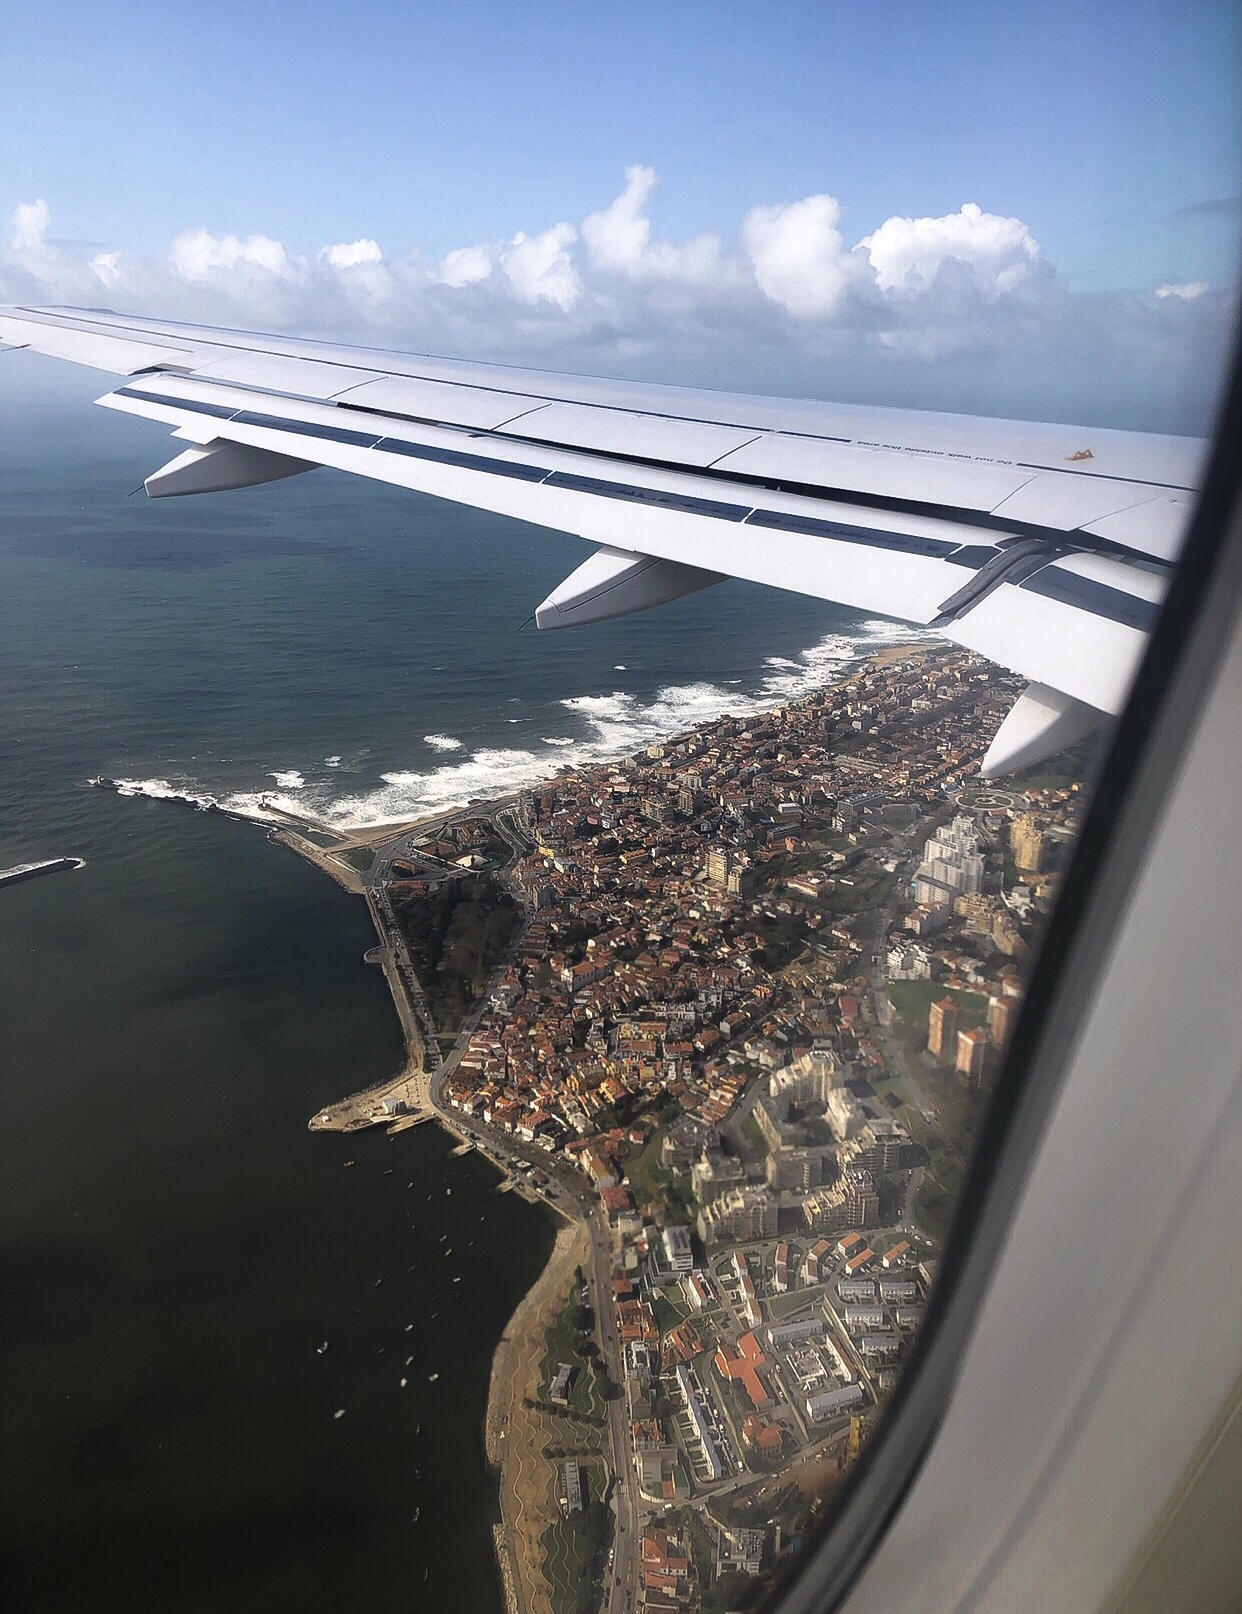 Porto-Reisebericht-Sightseeing-Tipps-Anflug-Porto-Miss-Suzie-Loves